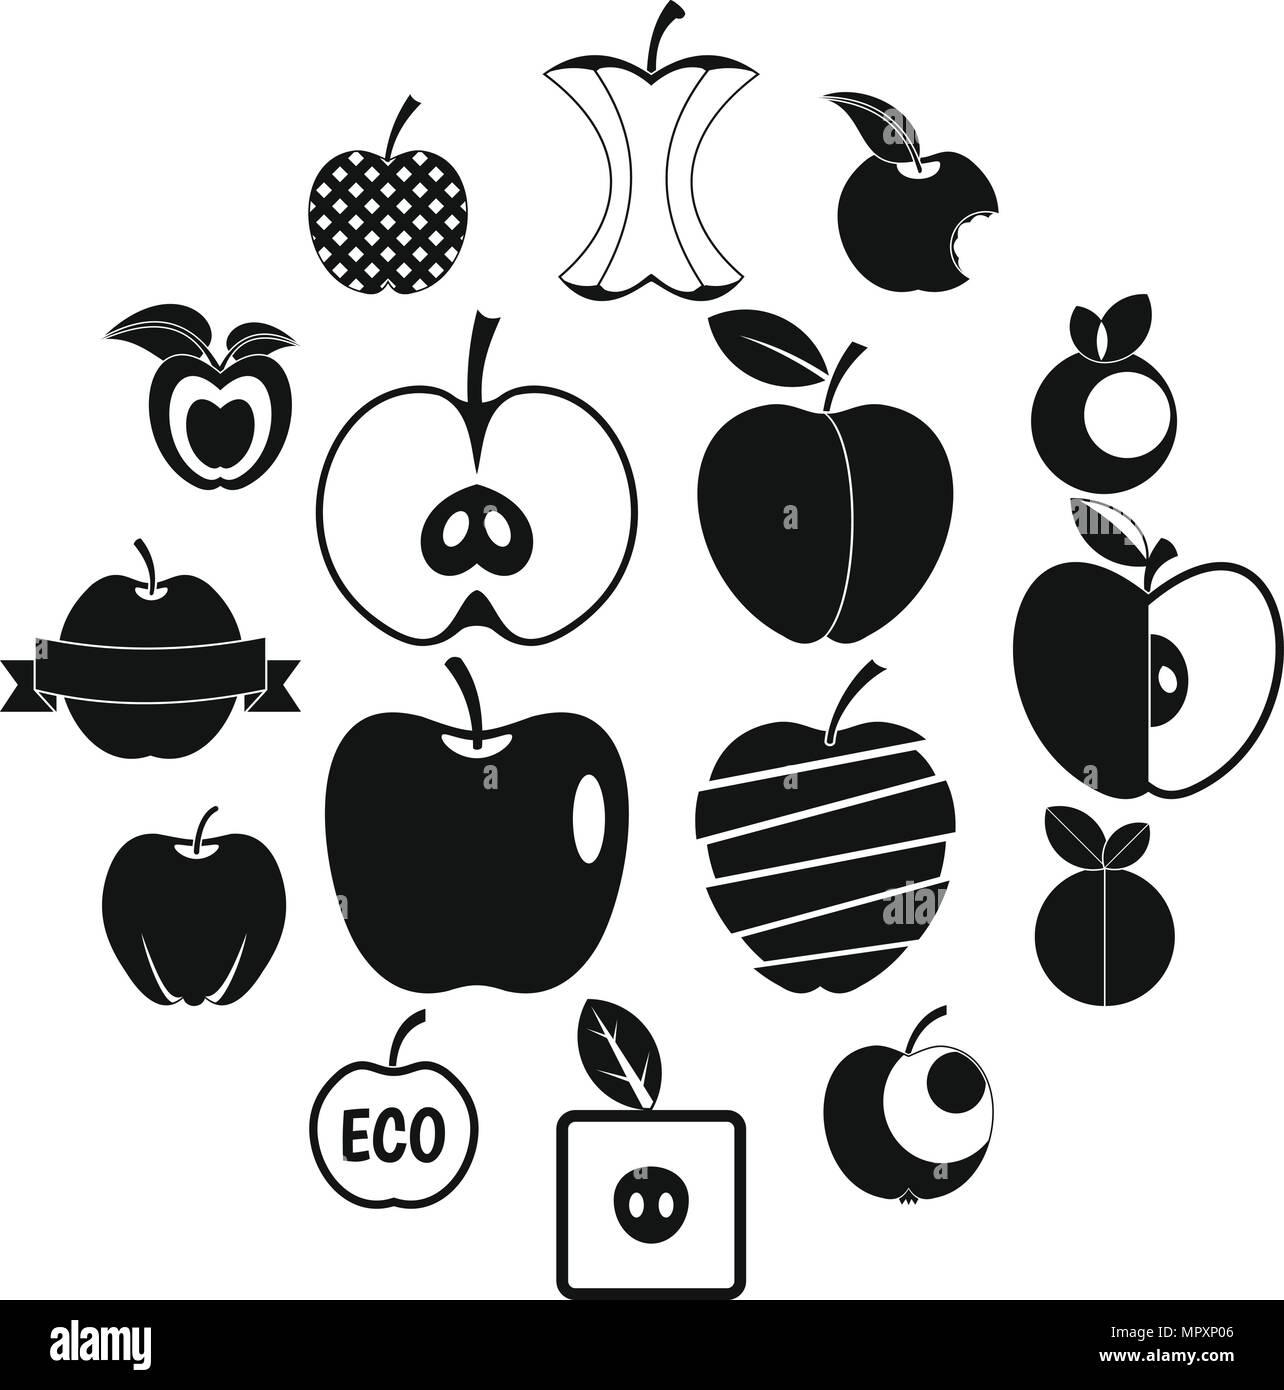 Apple icons set design logo, simple style Stock Vector Art